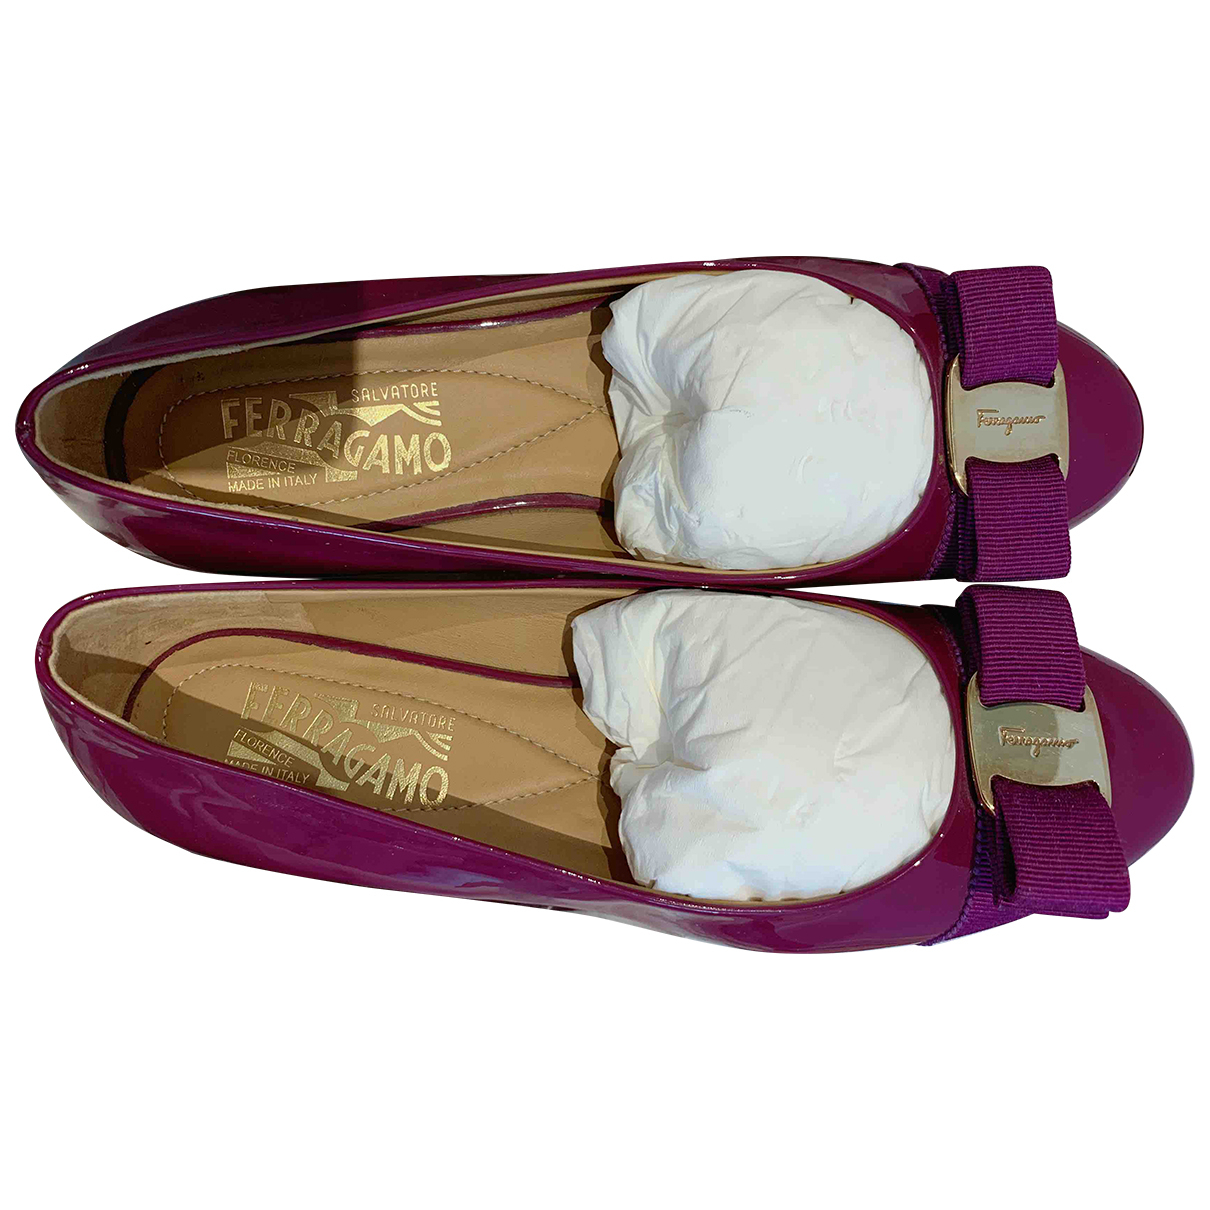 Salvatore Ferragamo - Ballerines   pour femme en cuir verni - violet